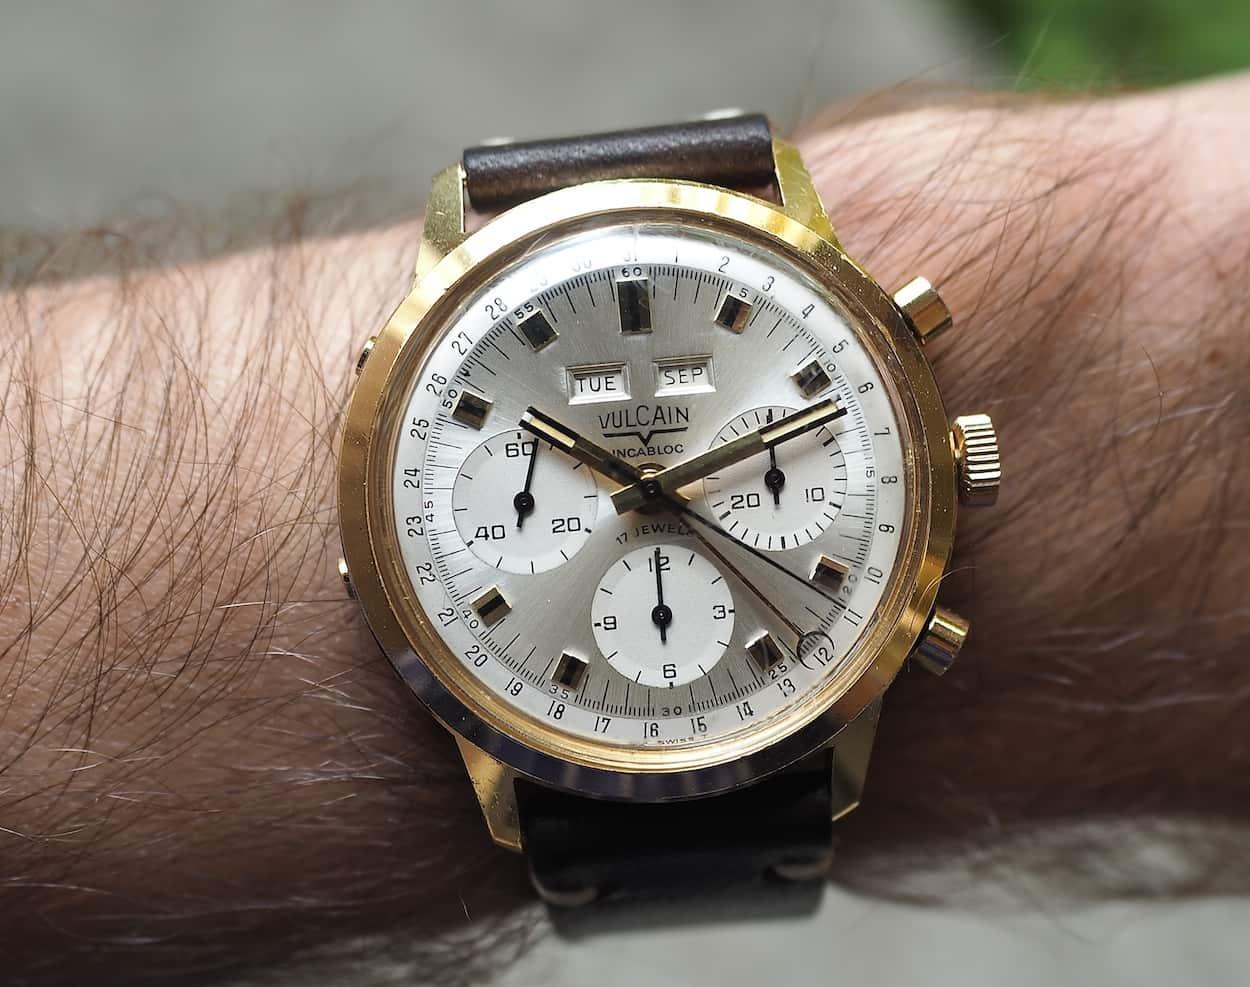 Vulcain Triple Date on the wrist